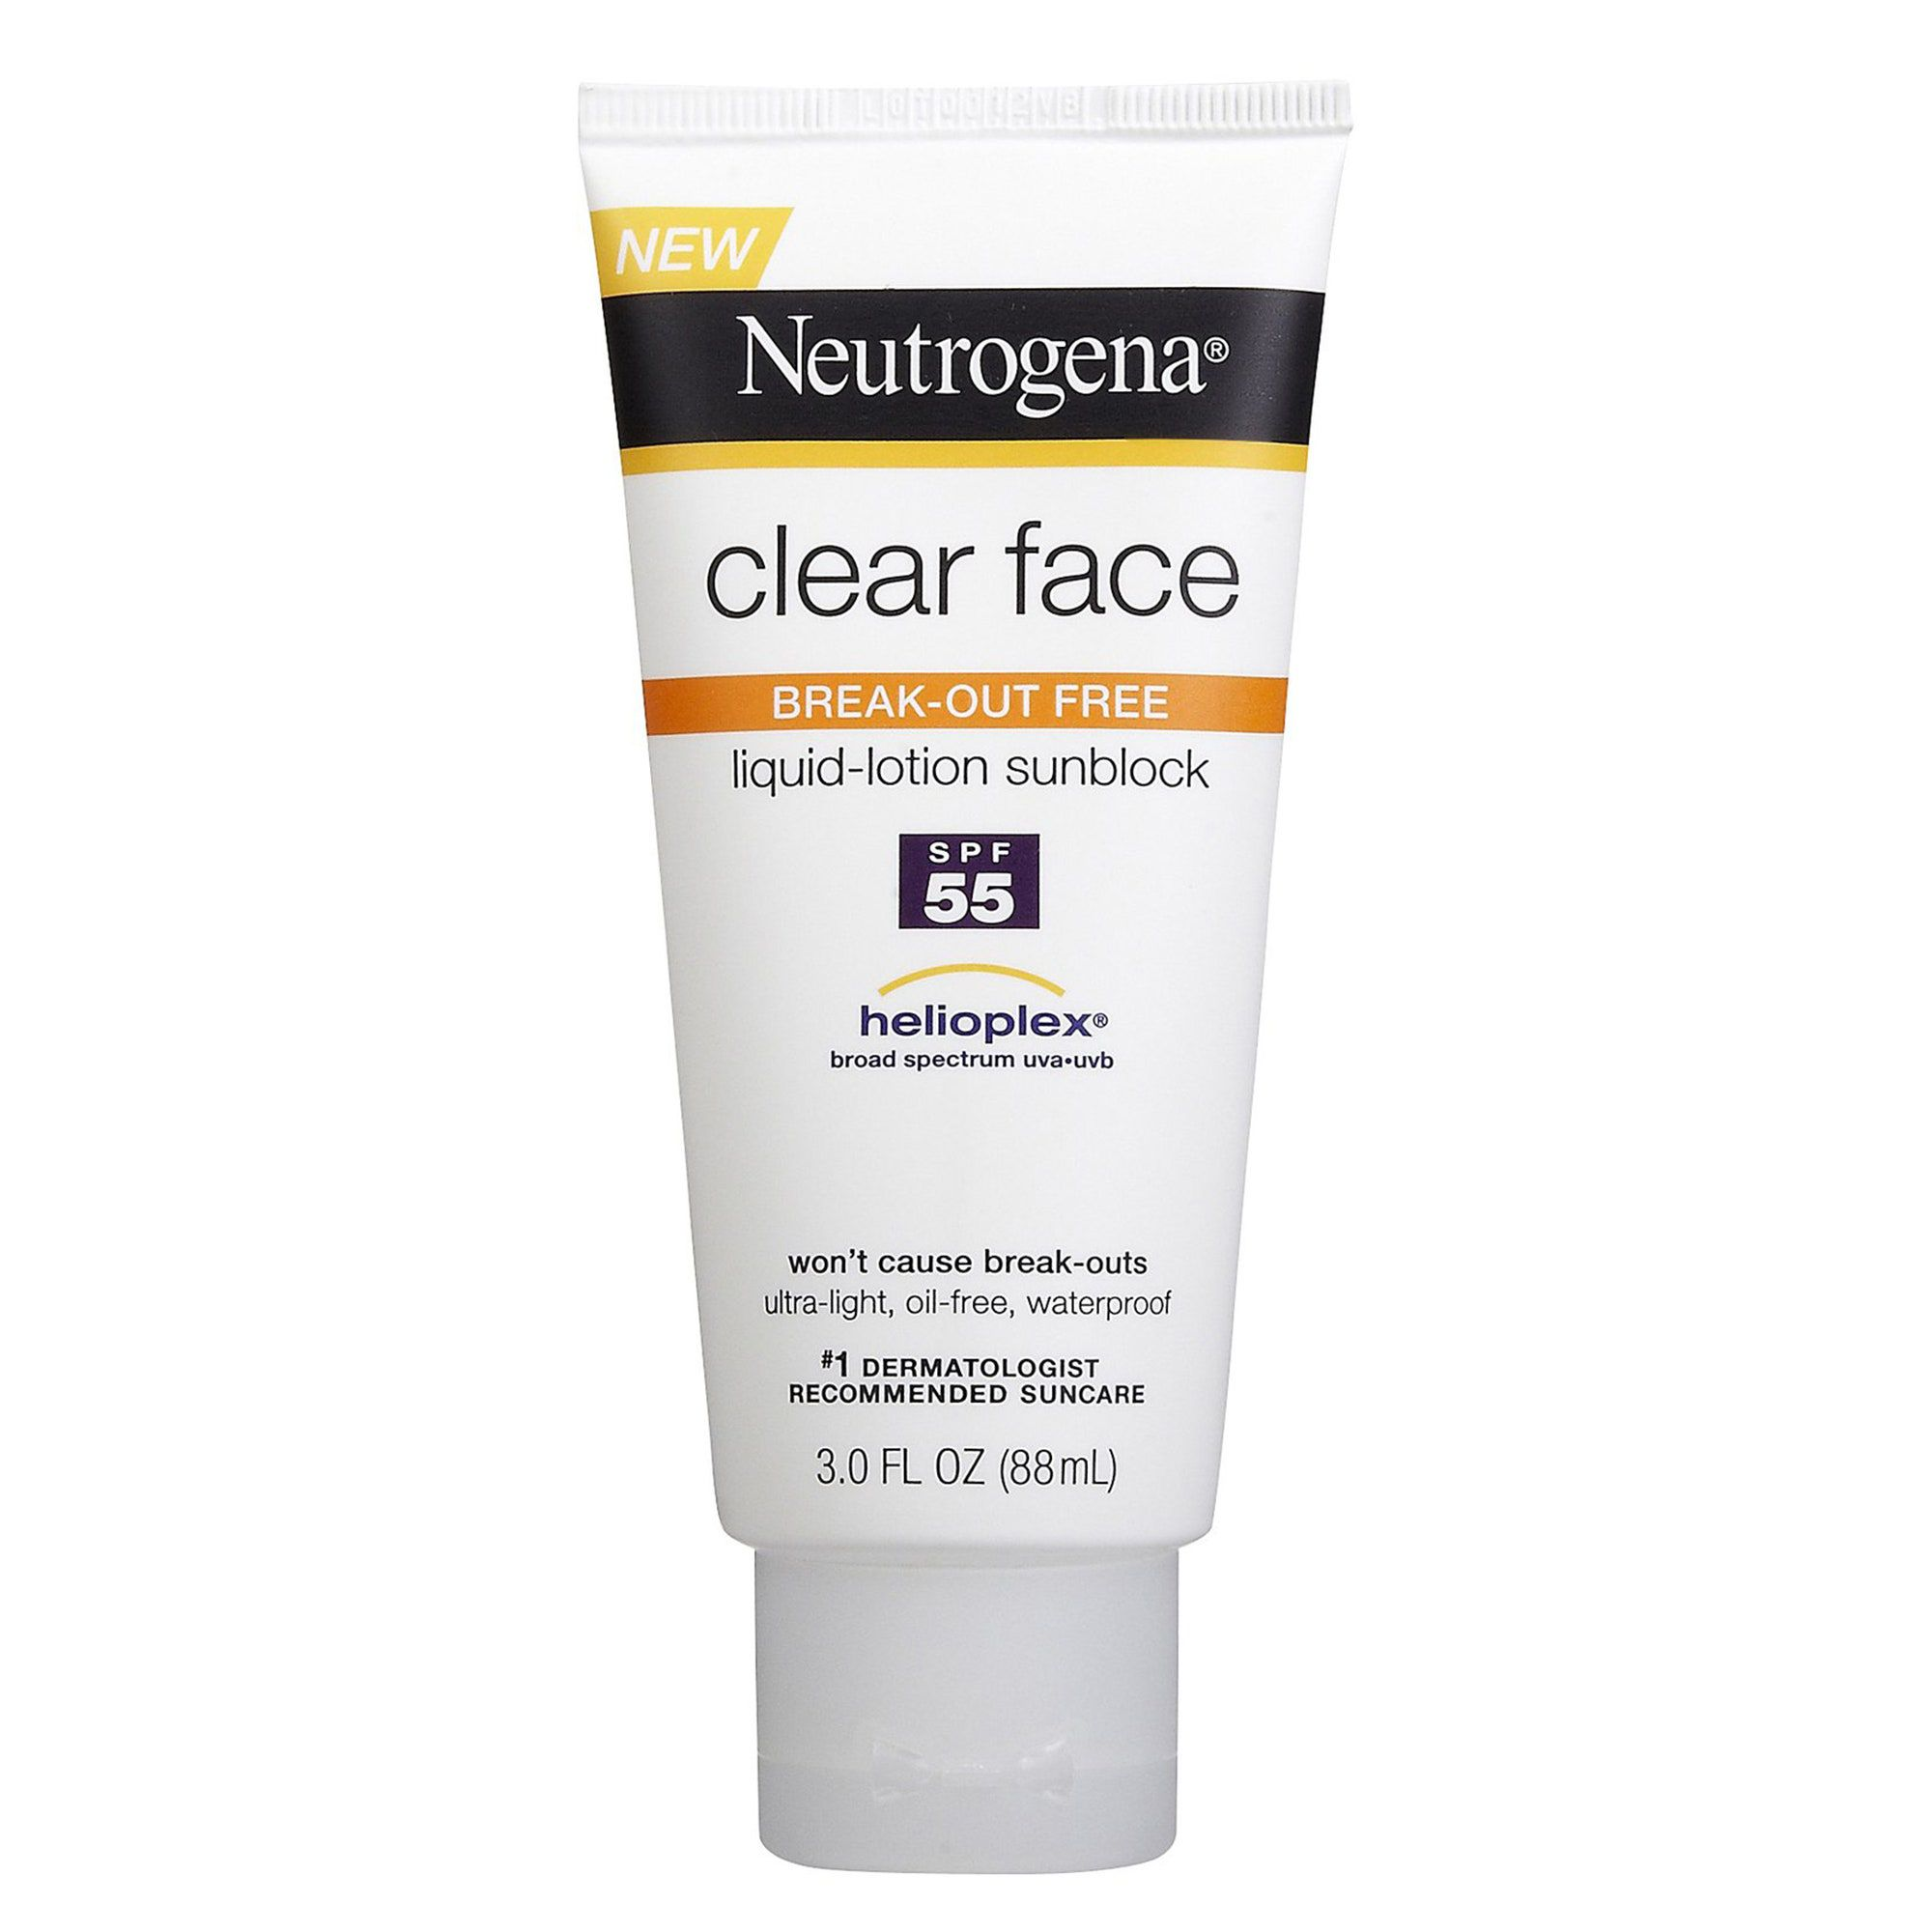 Neutrogena Clear Face Liquid Lotion Sunscreen for Acne-Prone Skin